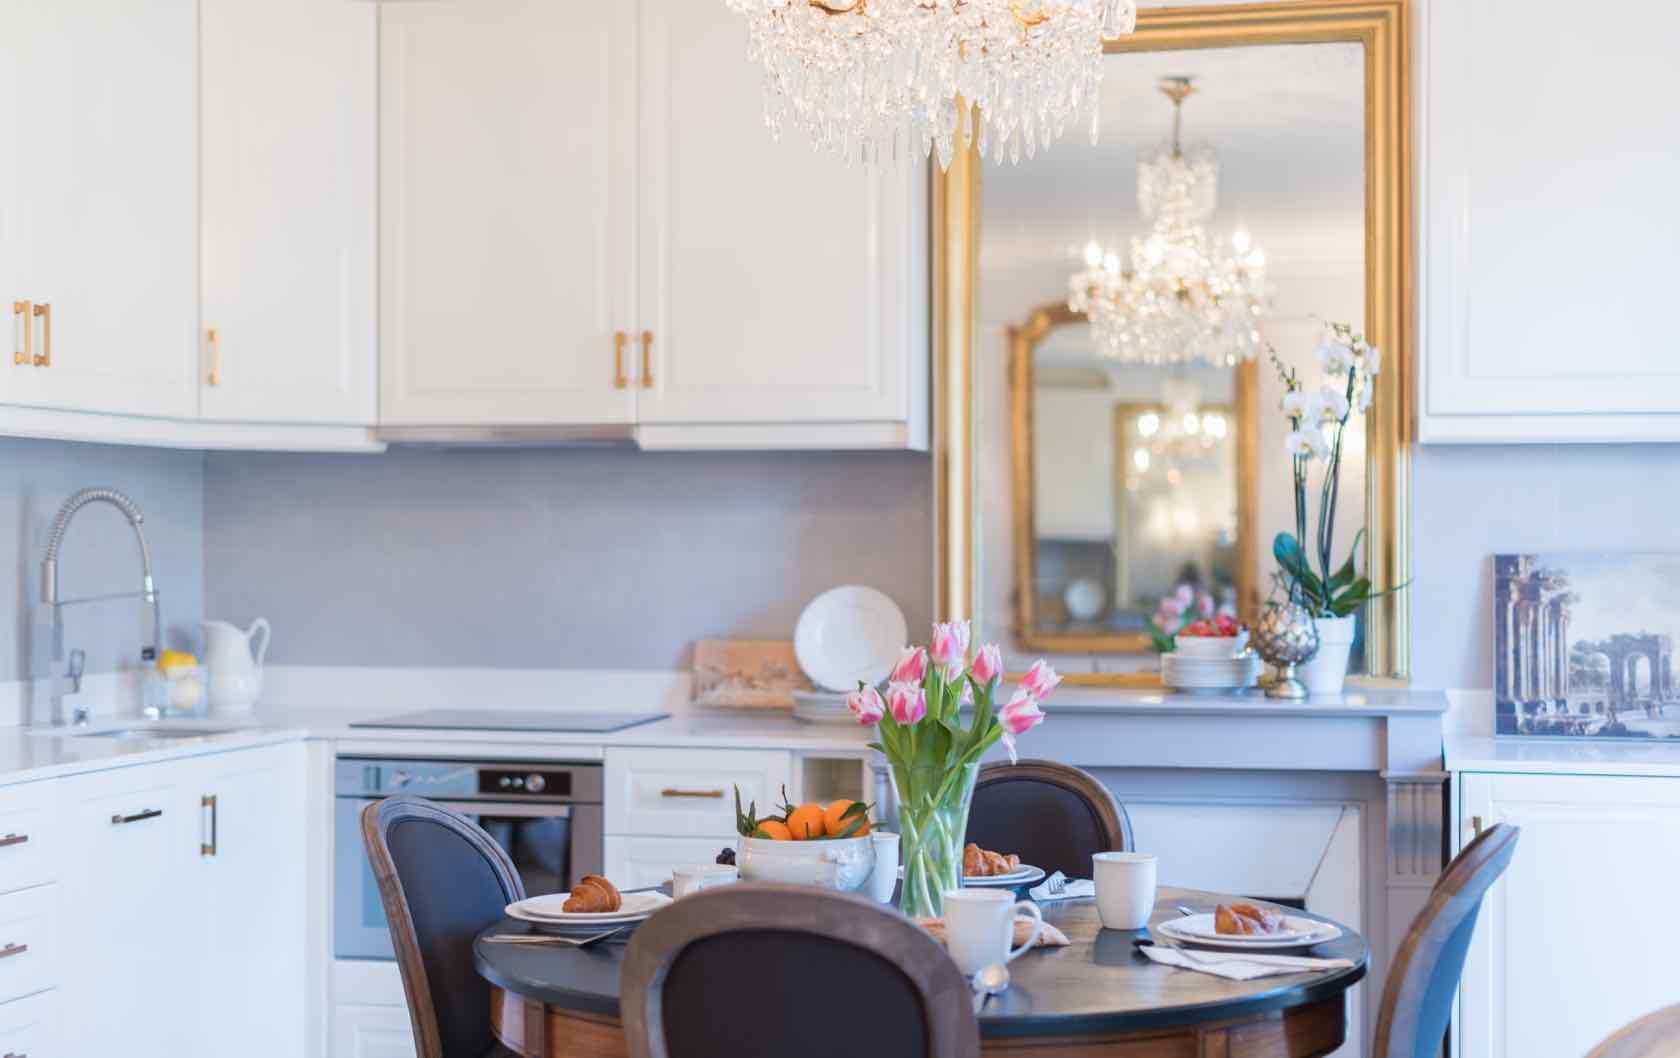 Cairranne fractinoal kitchen Paris